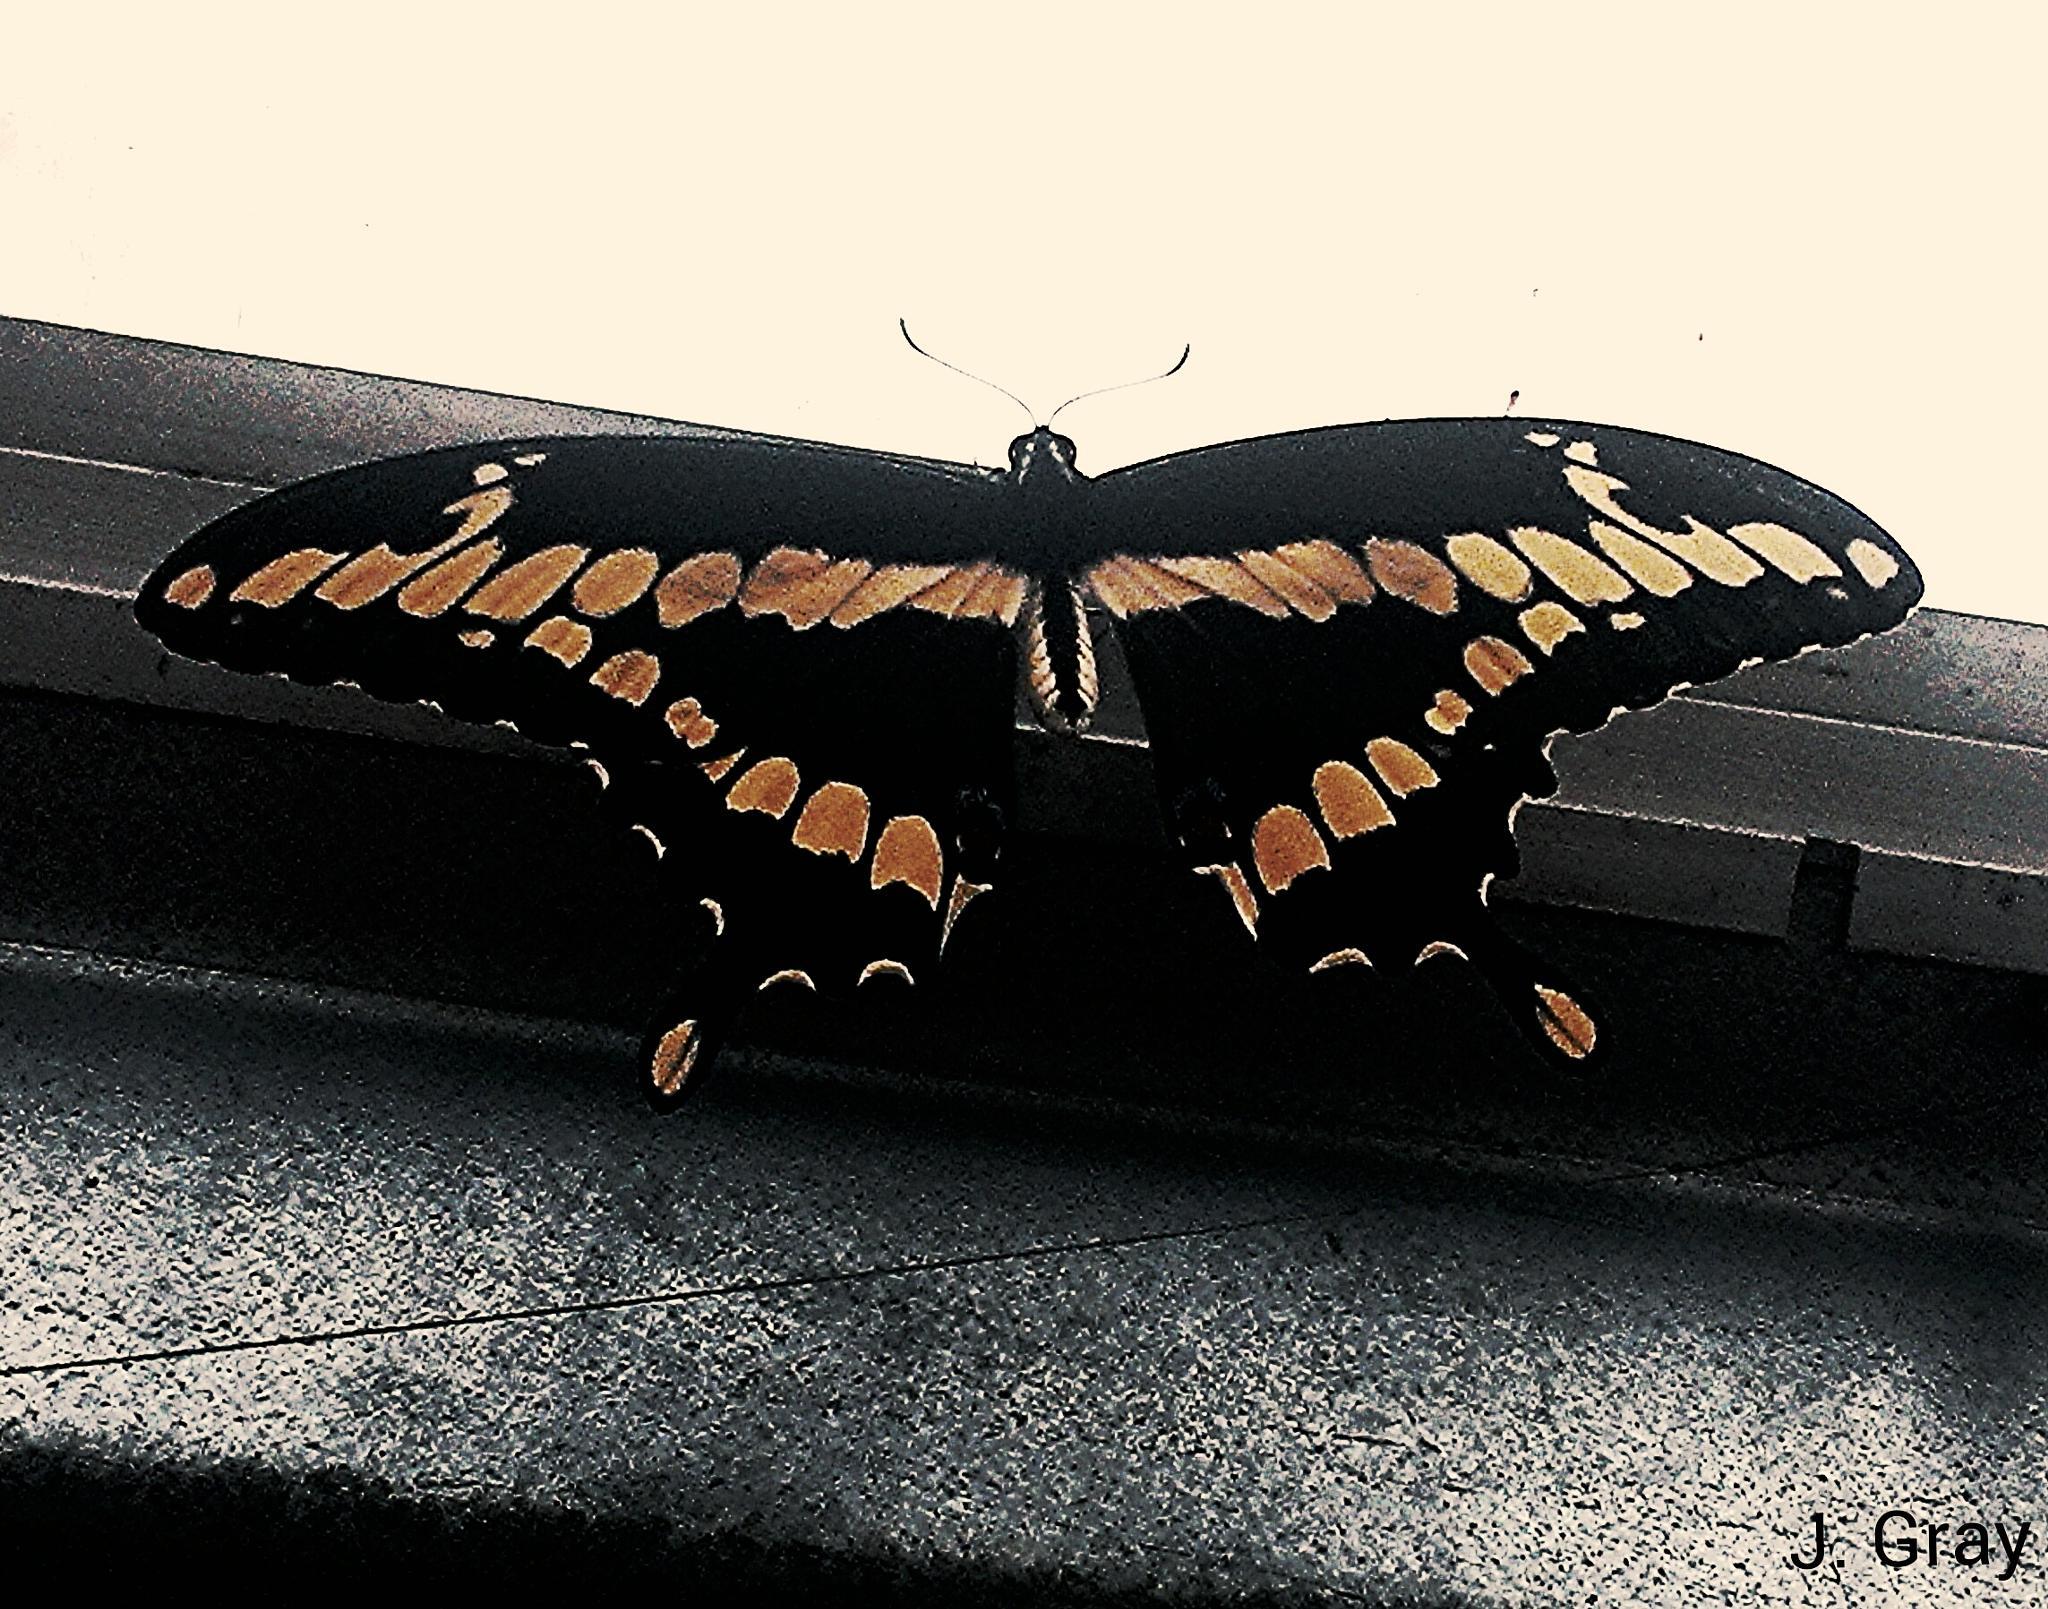 swallowtail butterfly by jpetree2